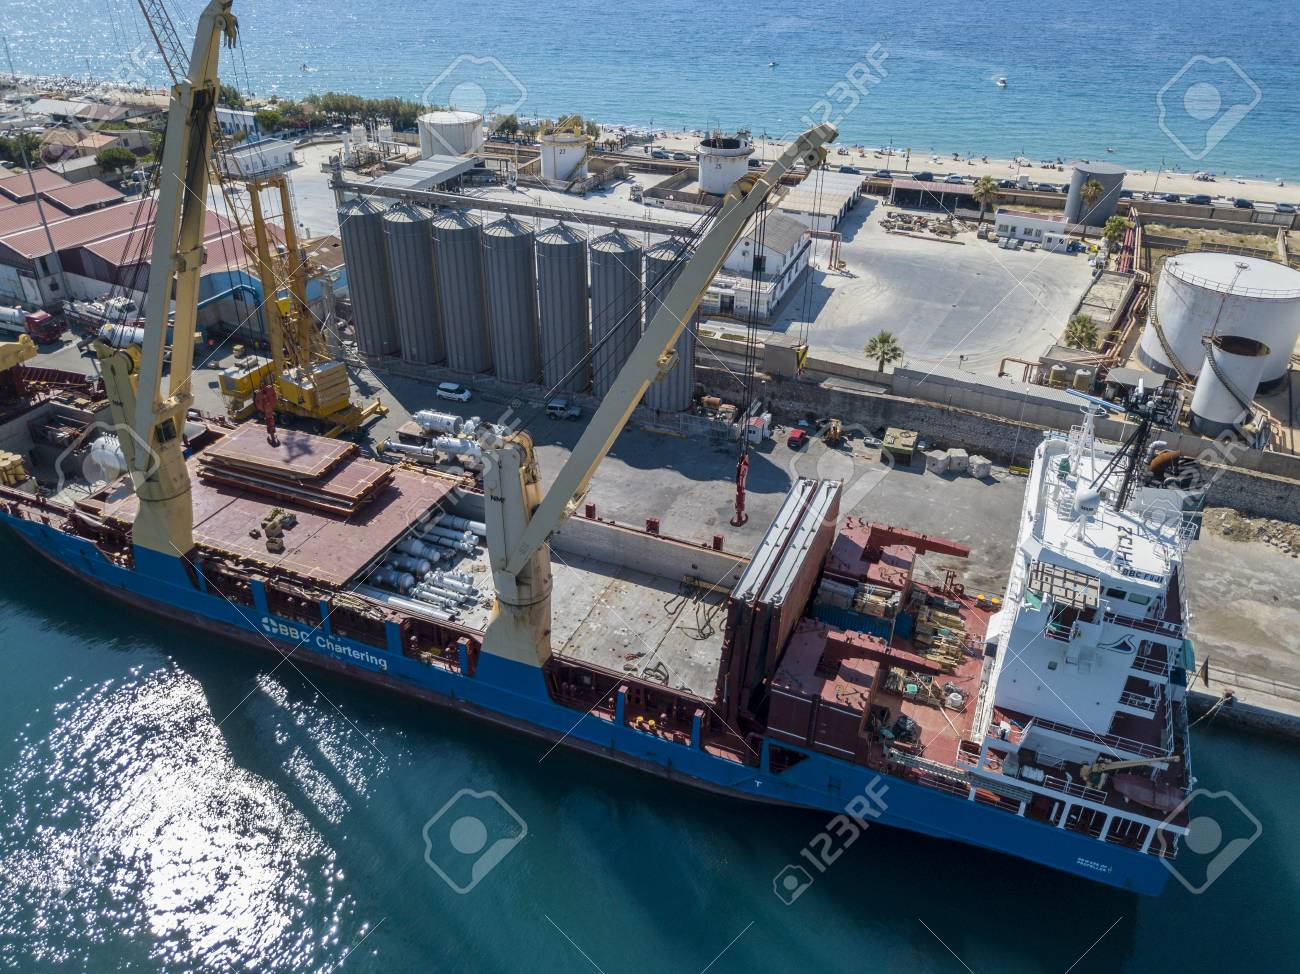 Cargo ship moored at the port of Vibo Marina, Calabria, Italy